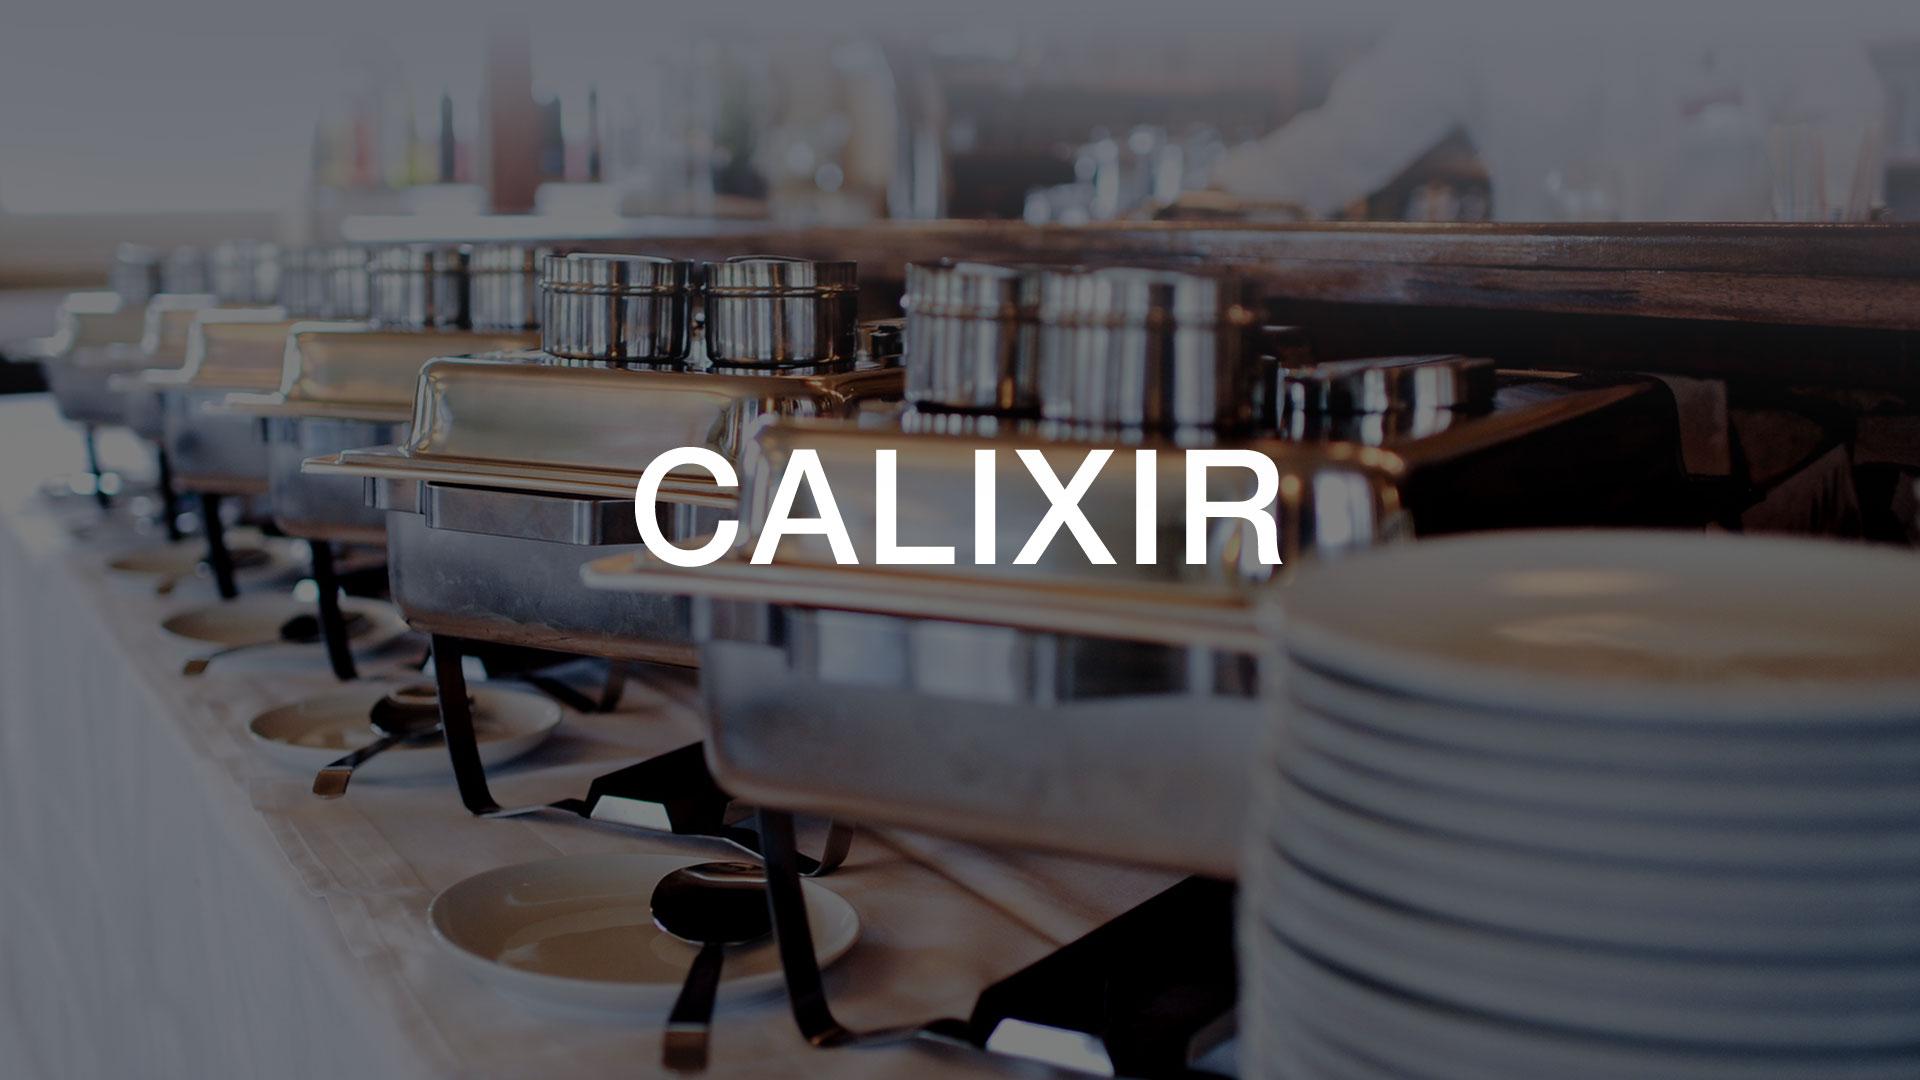 nom-d-entreprise-calixir-benefik-agence-naming-paris-changement-nom-marque